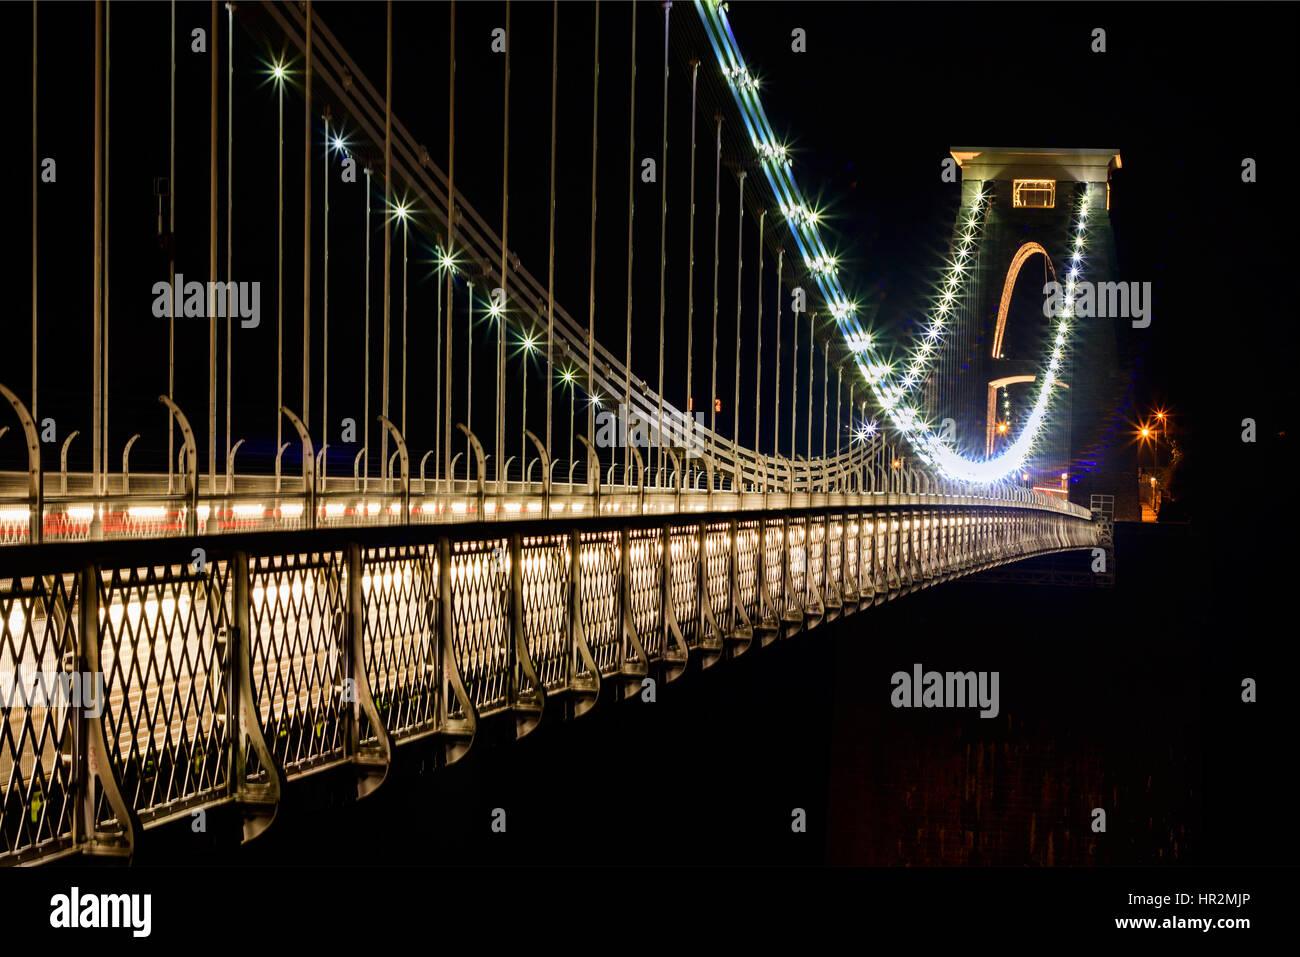 a-night-illuminated-clifton-suspension-b